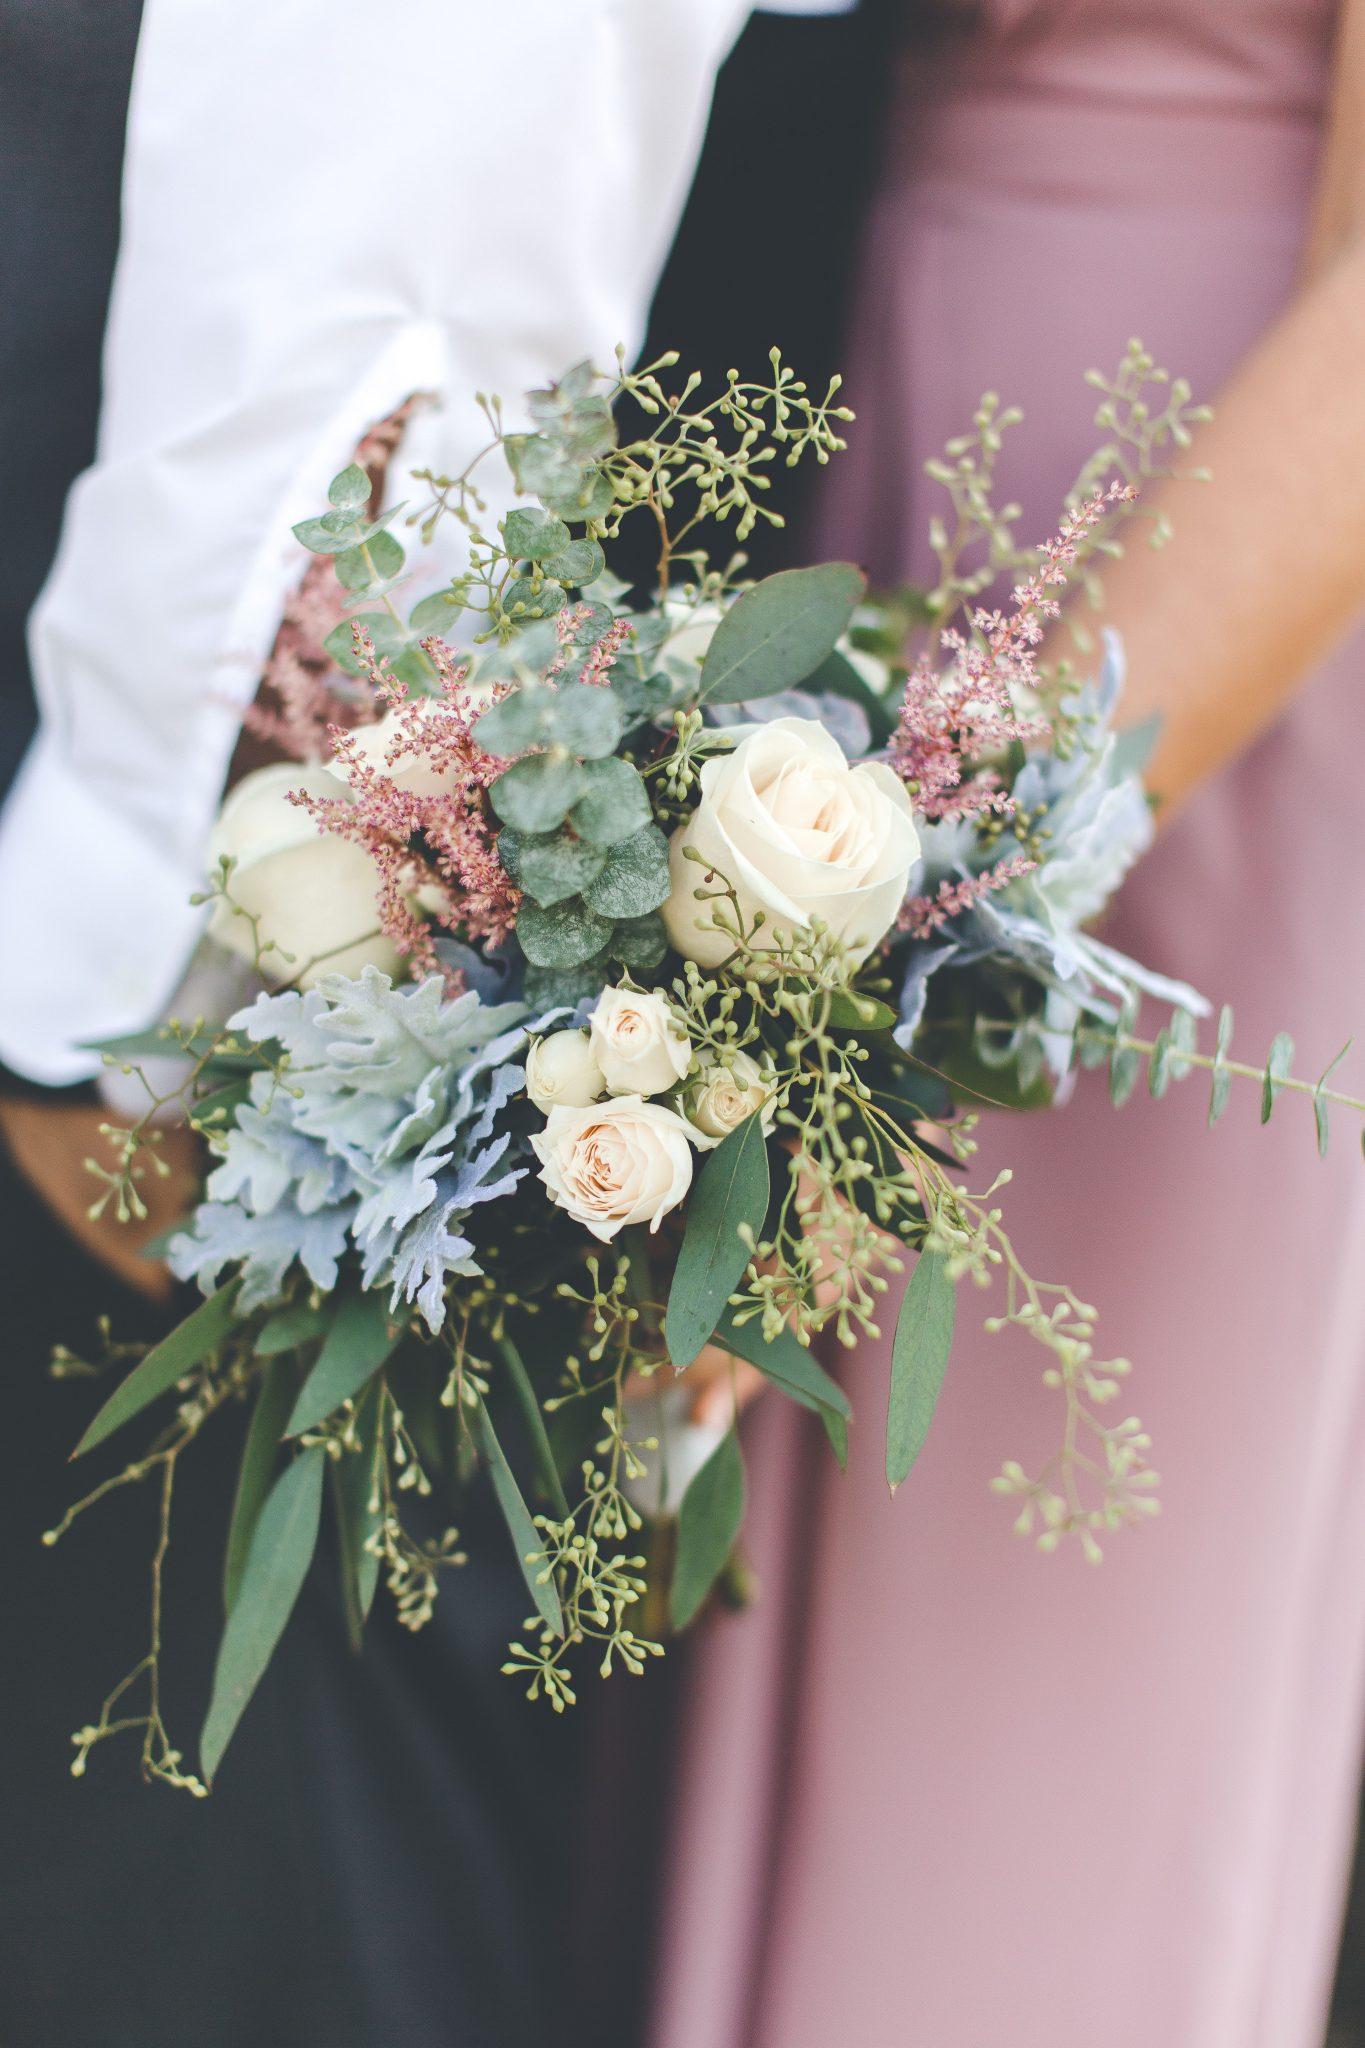 Bridesmaids bouquet, wedding flowers, wedding florist, dayton florist, dayton wedding florist, wedding florist, dayton wedding, dayton weddings